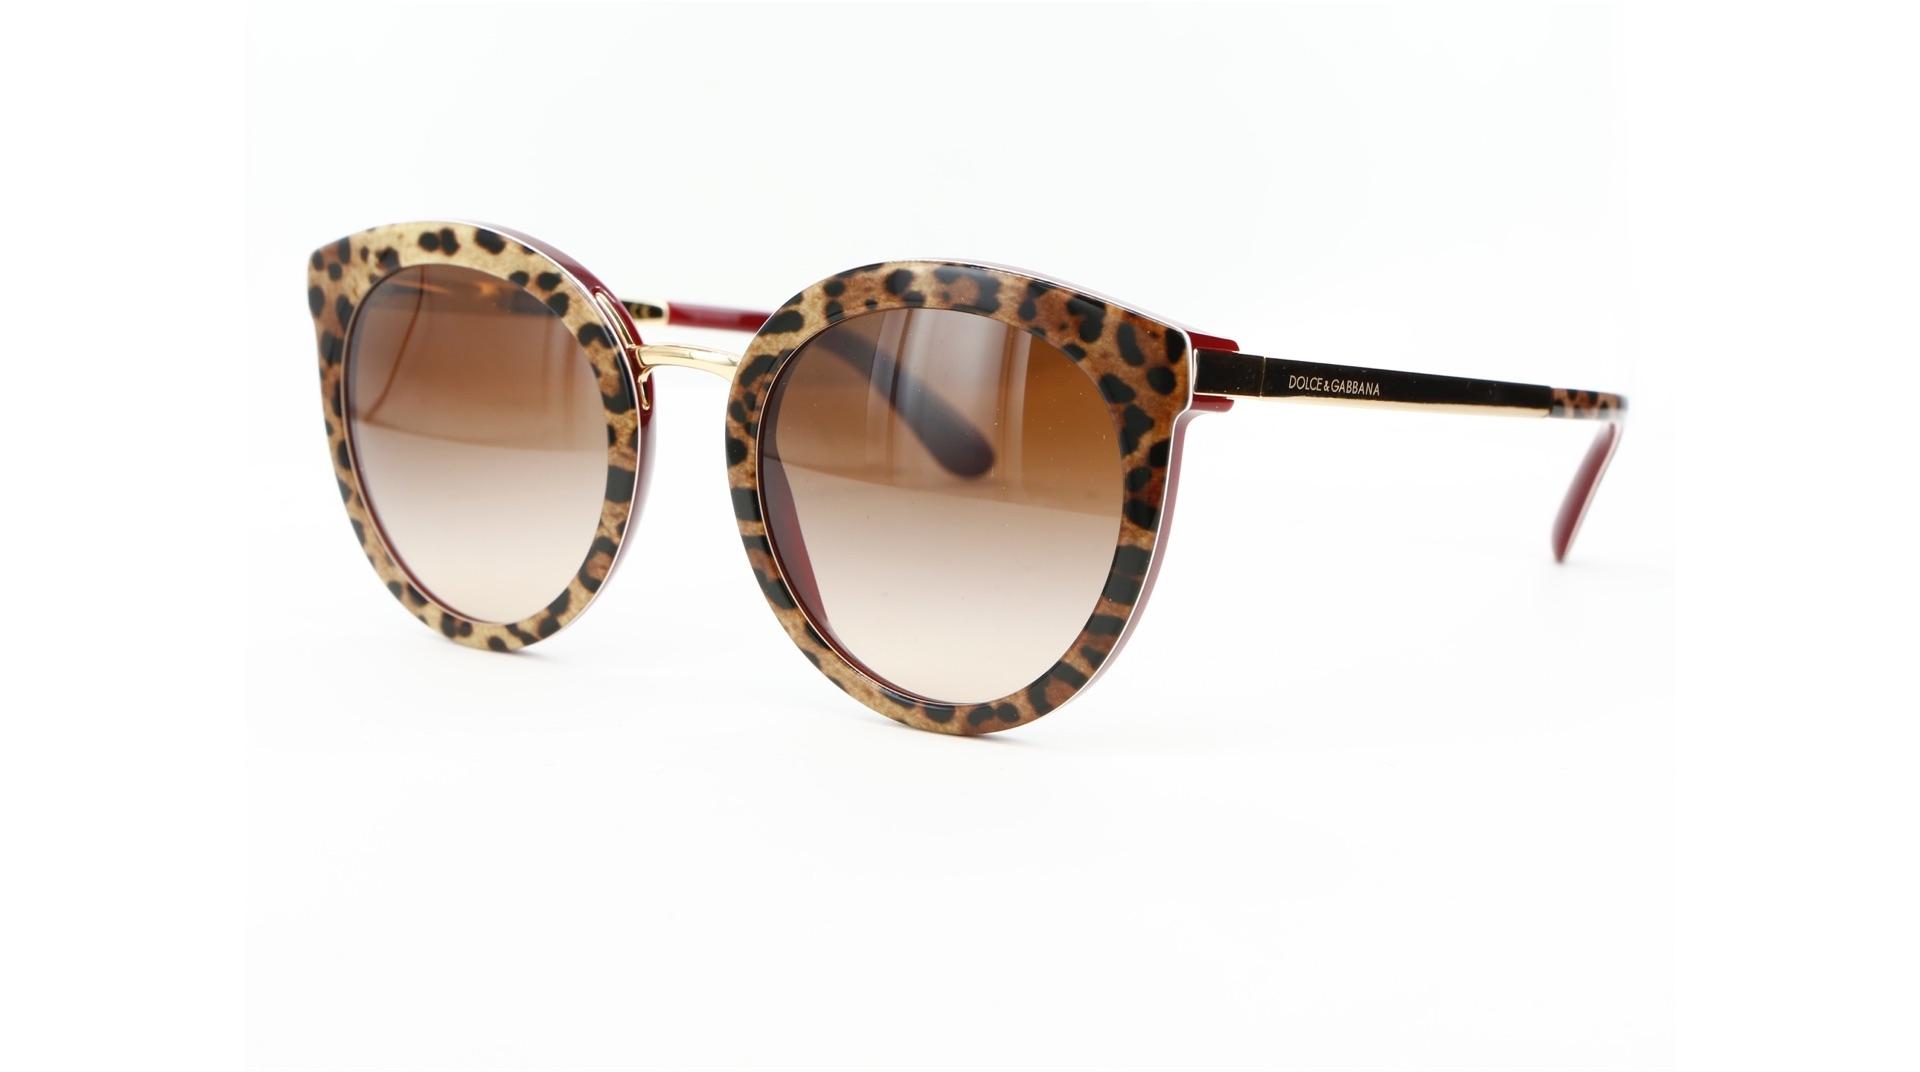 Dolce & Gabbana - ref: 81314